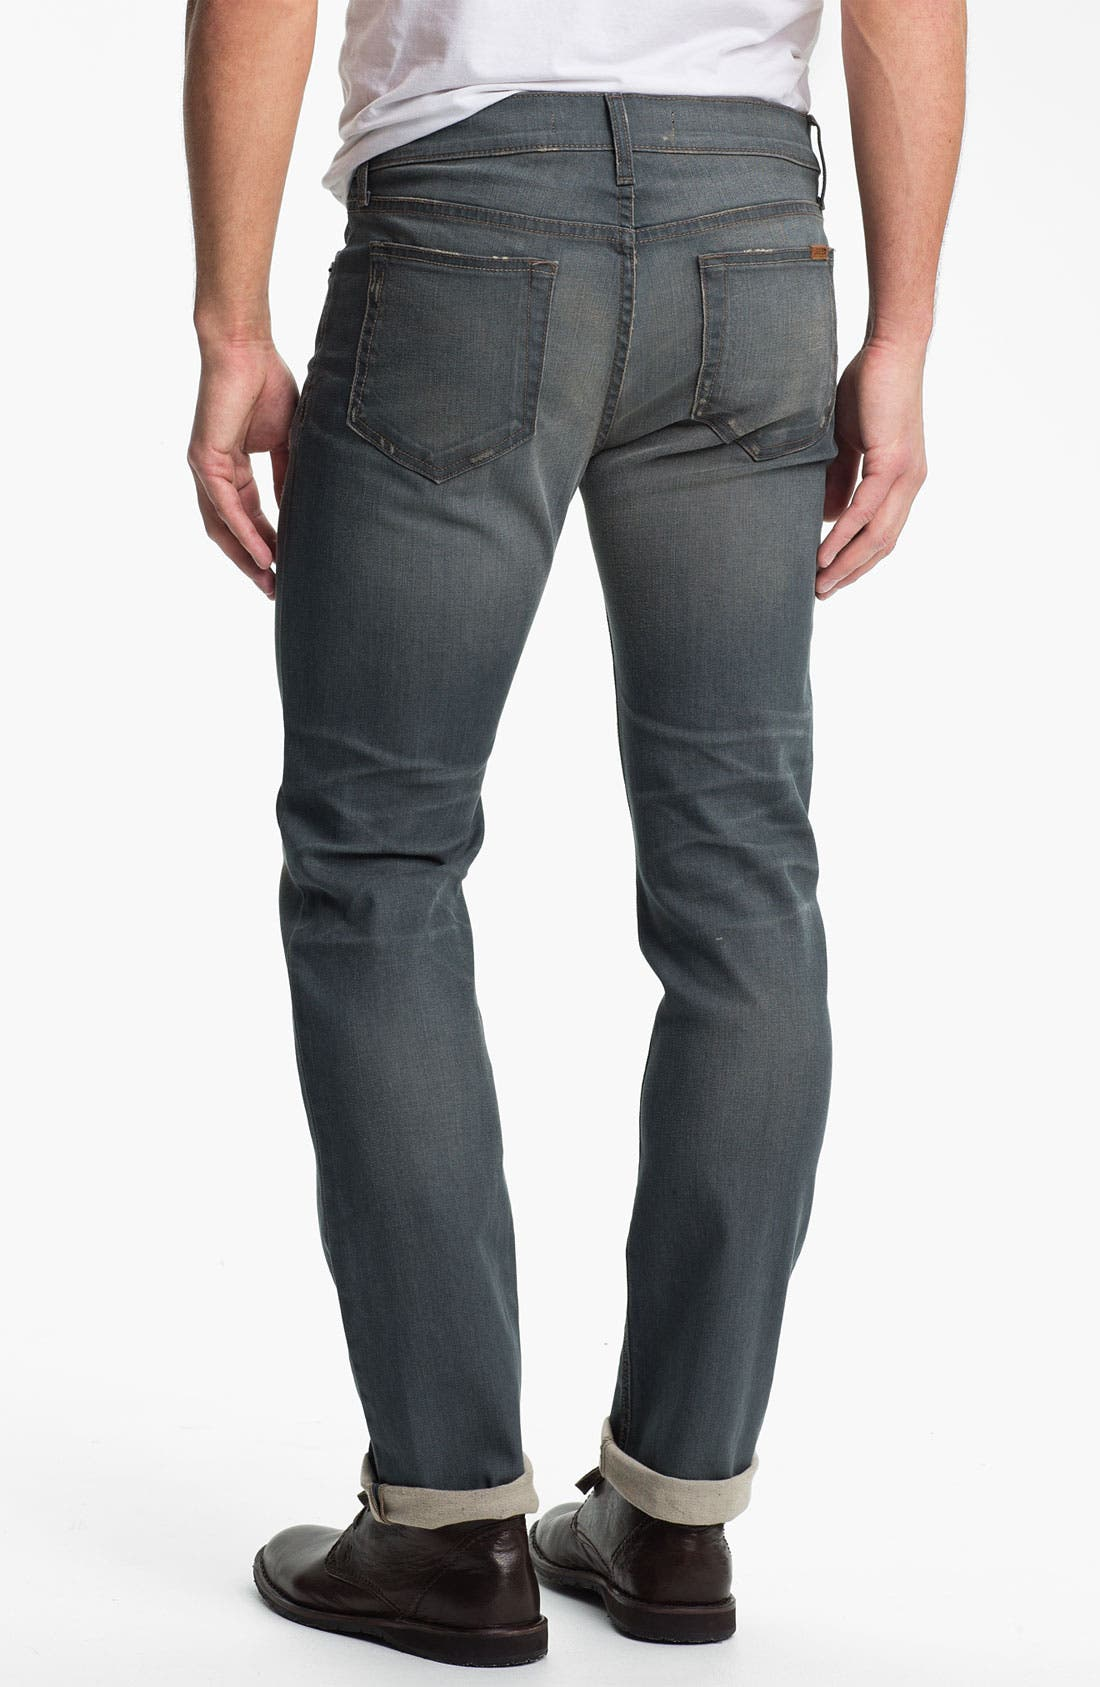 Alternate Image 1 Selected - Joe's 'Brixton' Slim Straight Leg Jeans (Ewan)